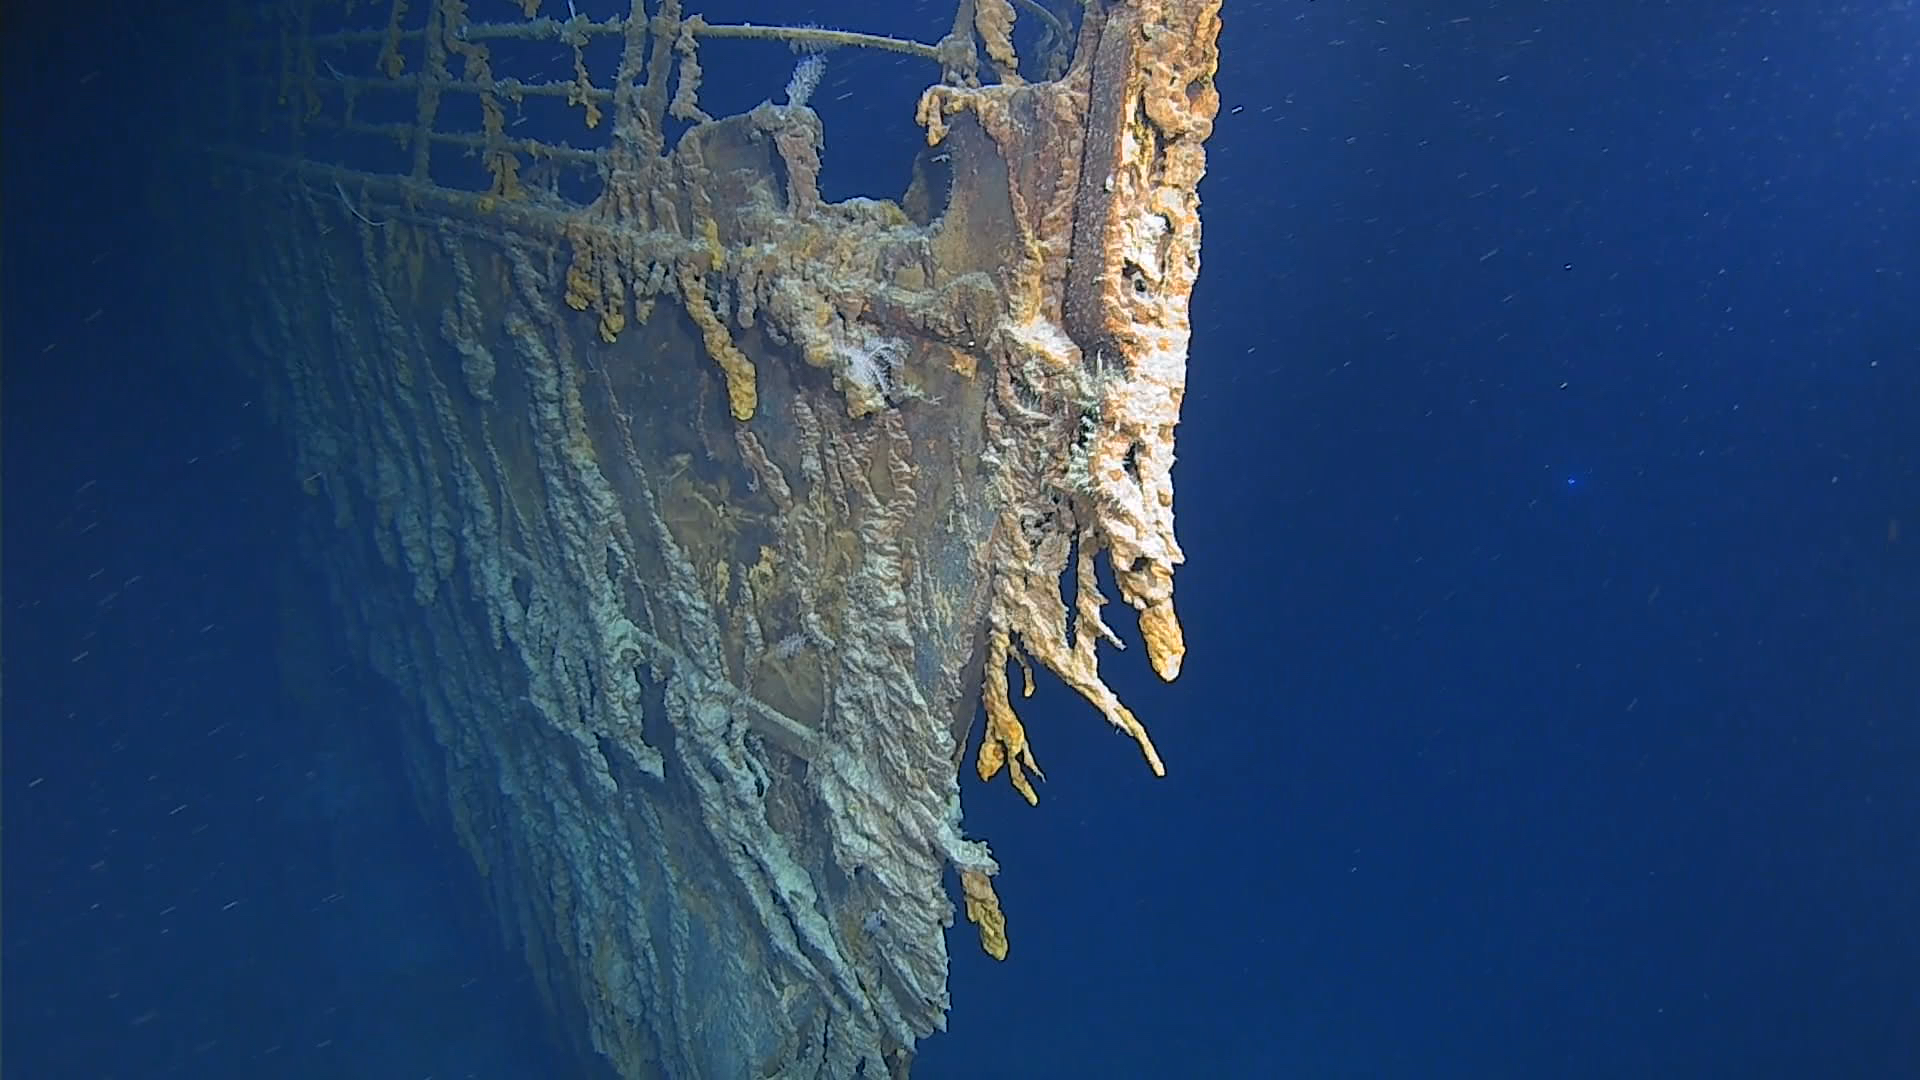 RMS Titanic's bow